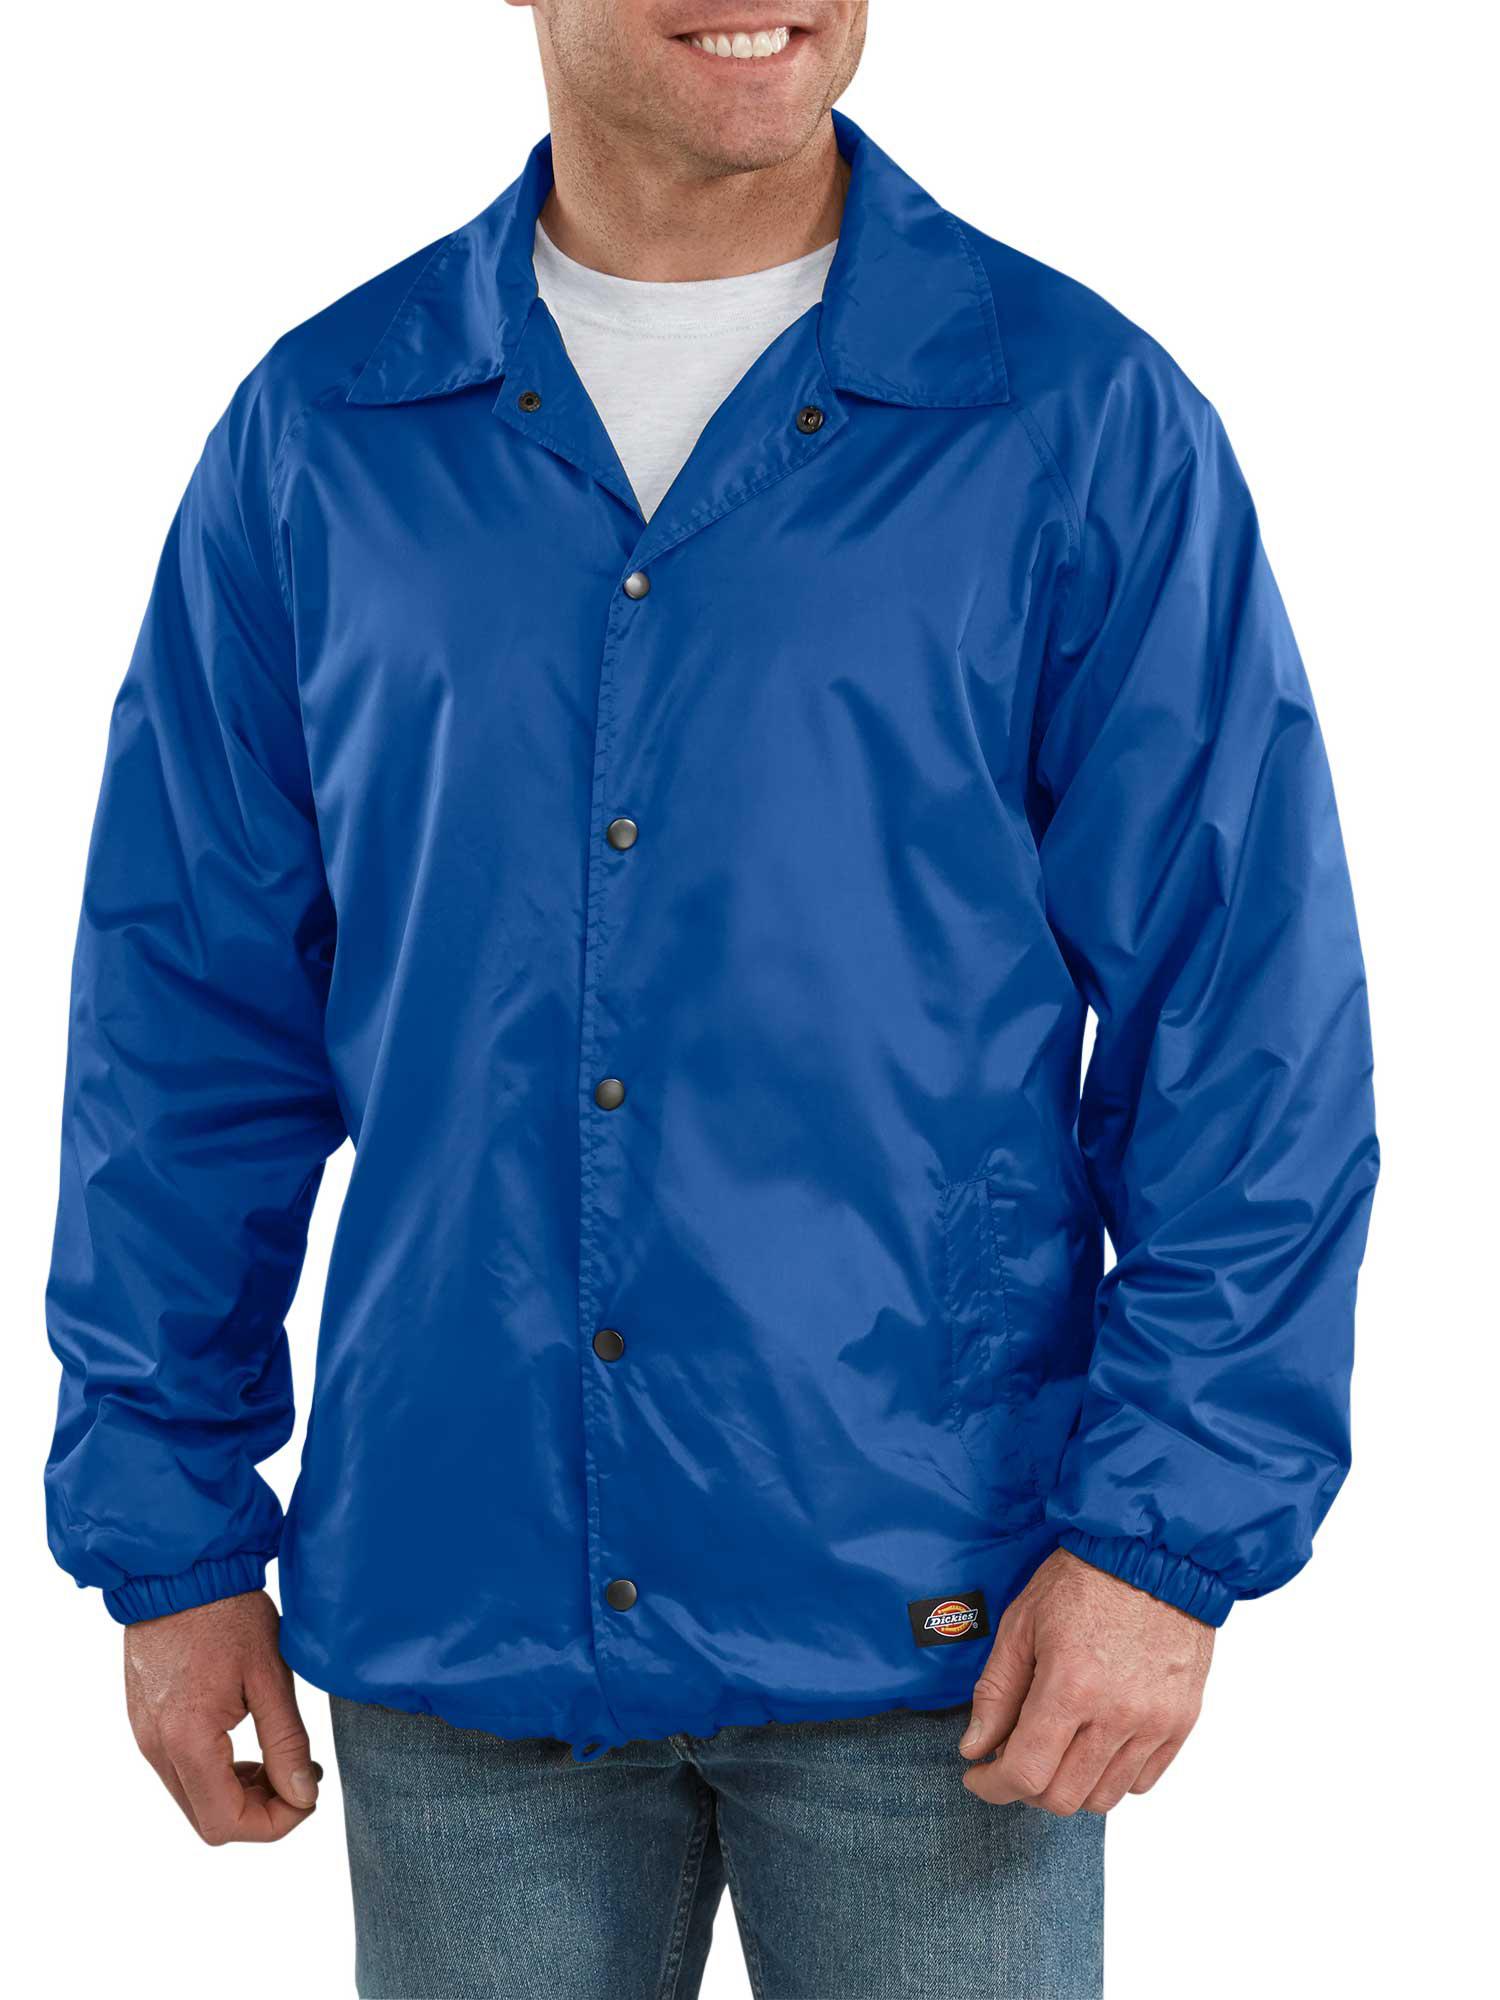 Men's Snap Front Nylon Jacket